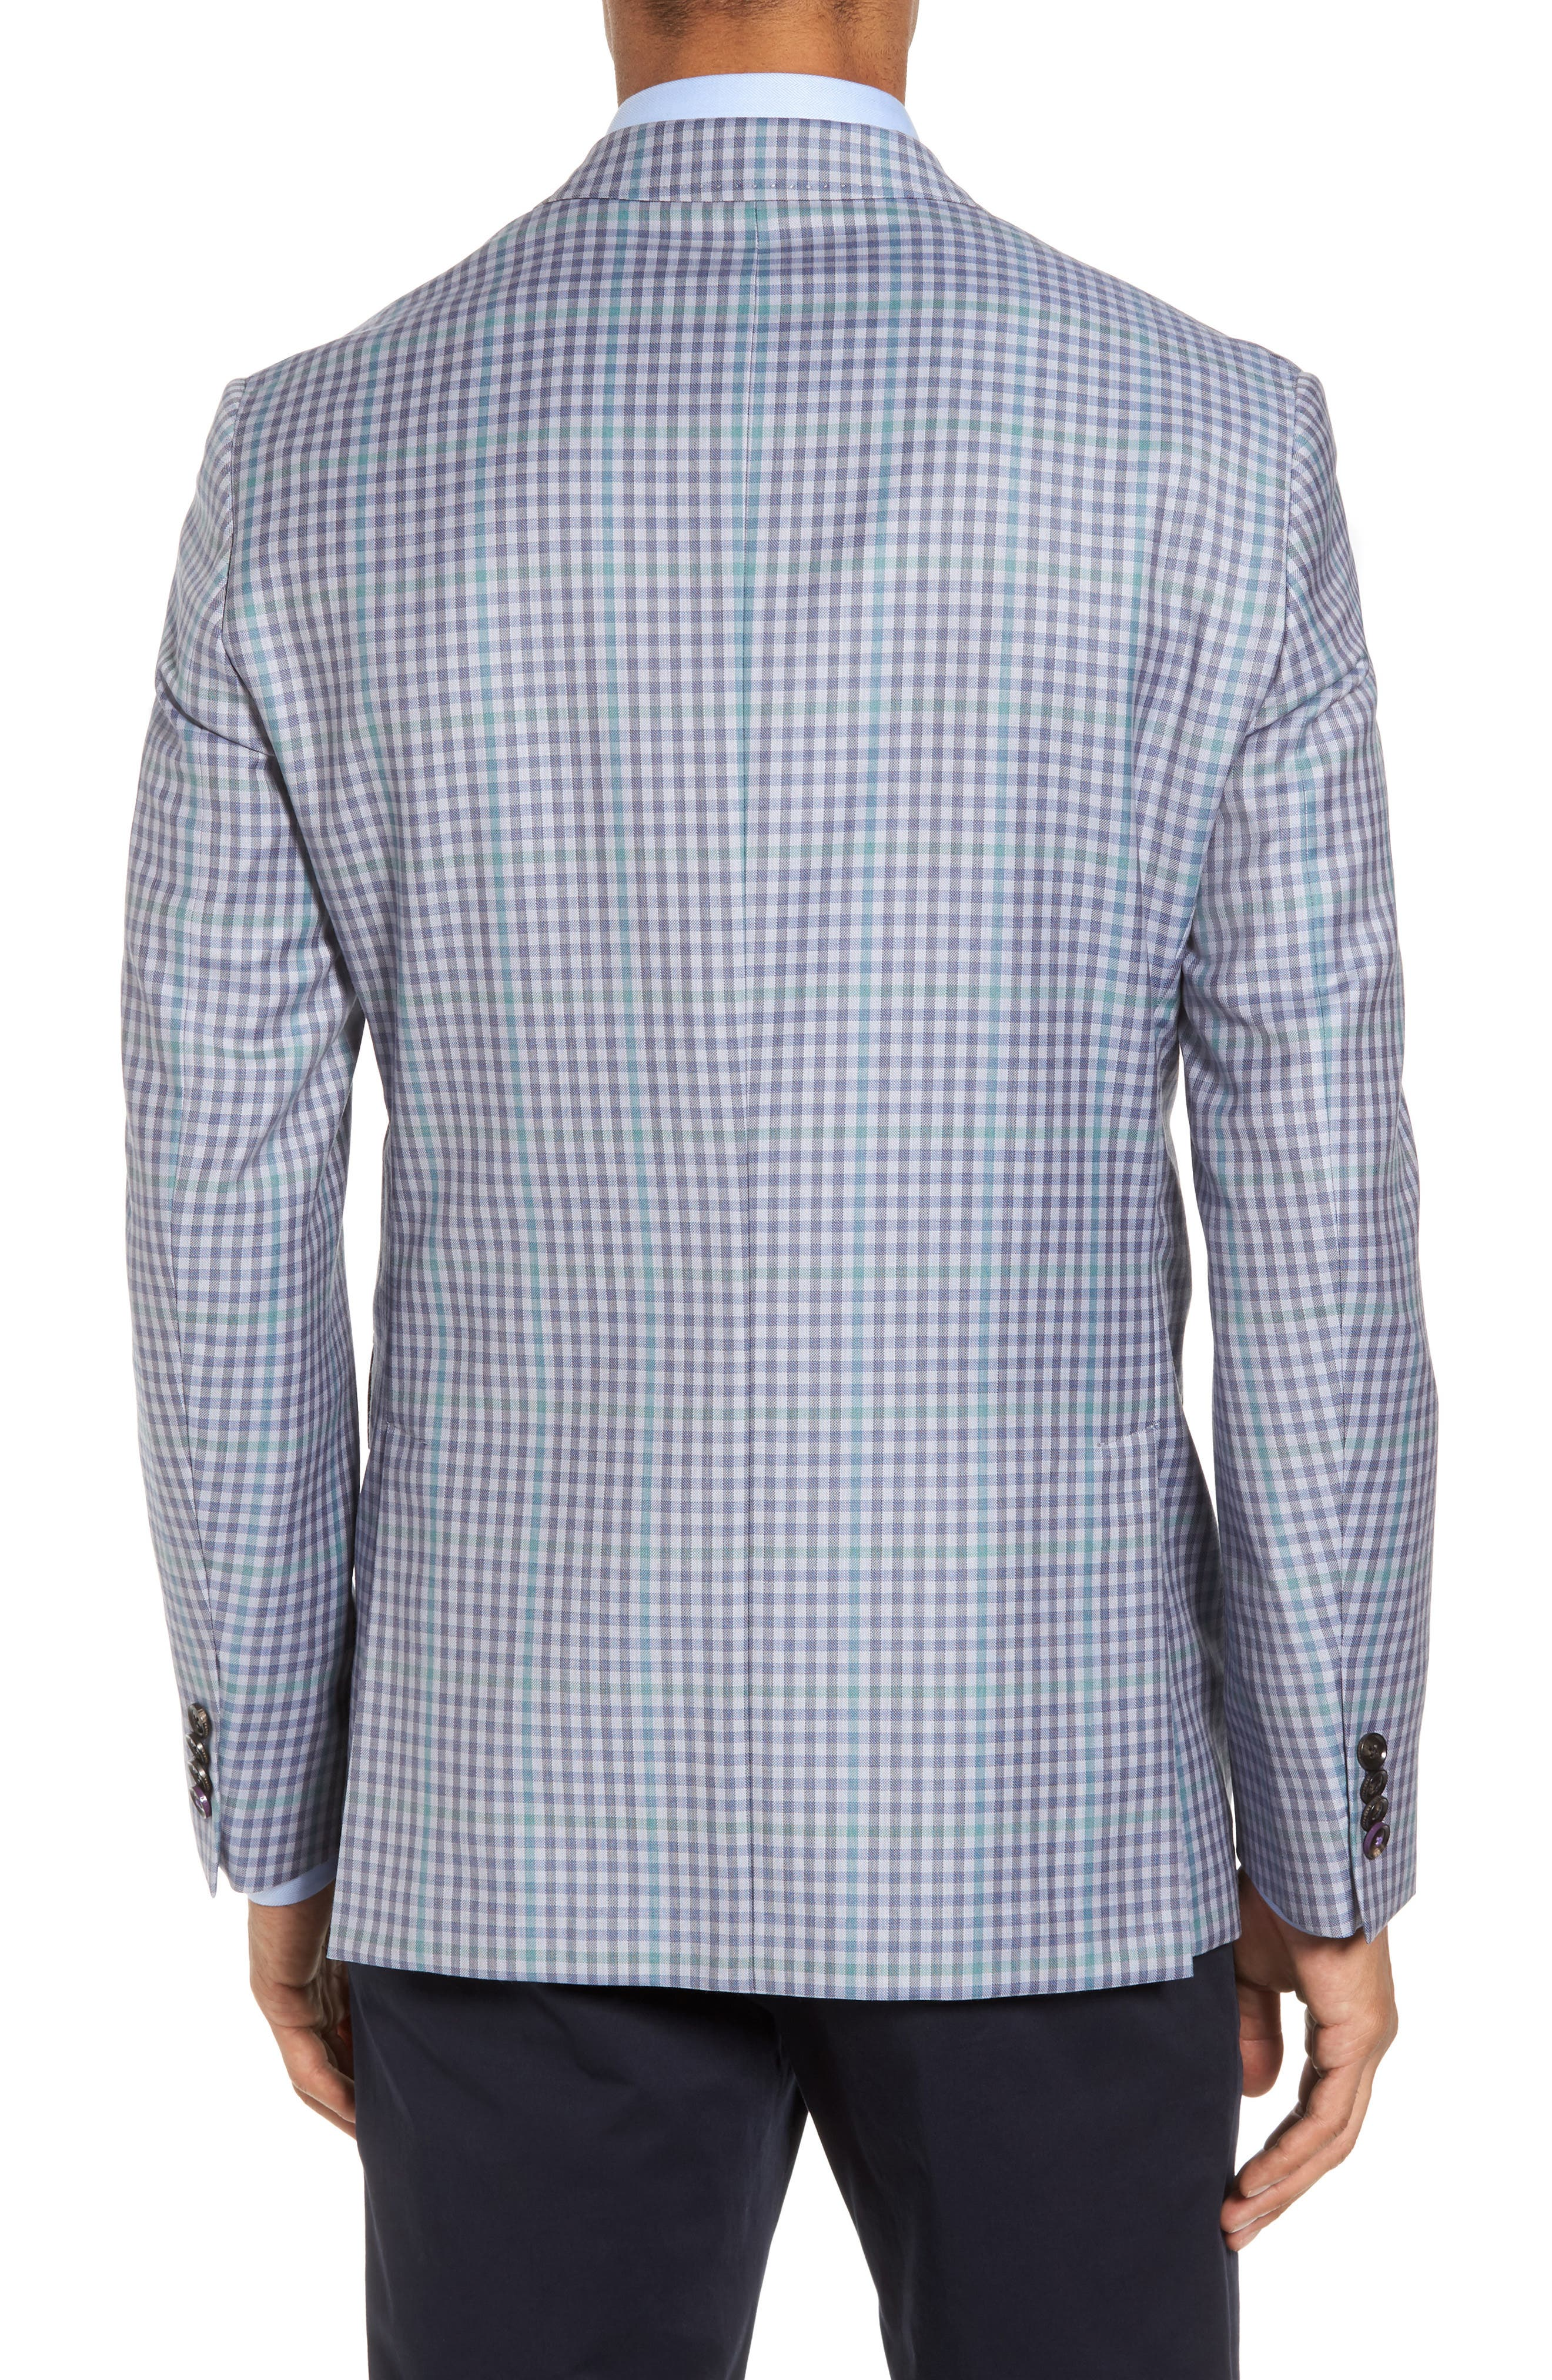 Konan Trim Fit Check Wool Sport Coat,                             Alternate thumbnail 2, color,                             Blue Grey Green Ck